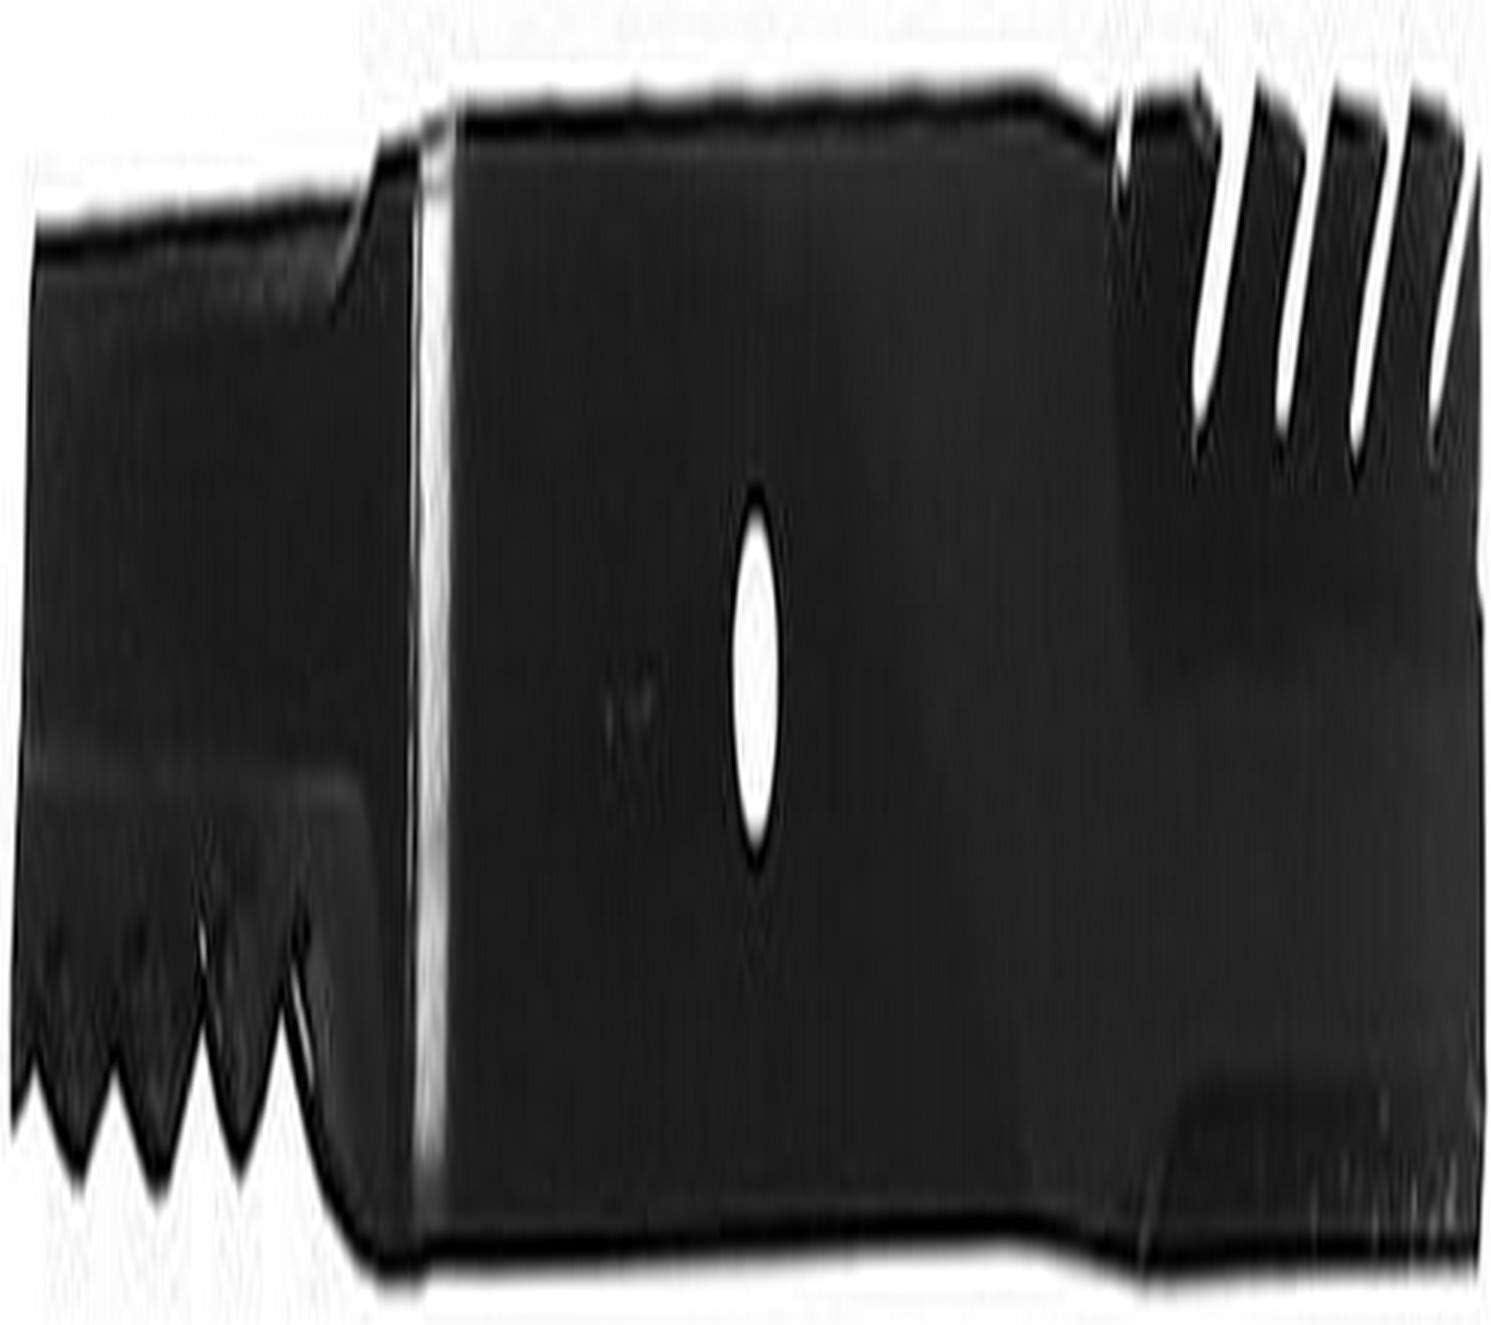 Oregon 95-607 Gator Mulcher 3-N-1 Blade for 44-Inch AYP//Husqvarna//Poulan Pro//Sears//Craftsman Lawn Mowers